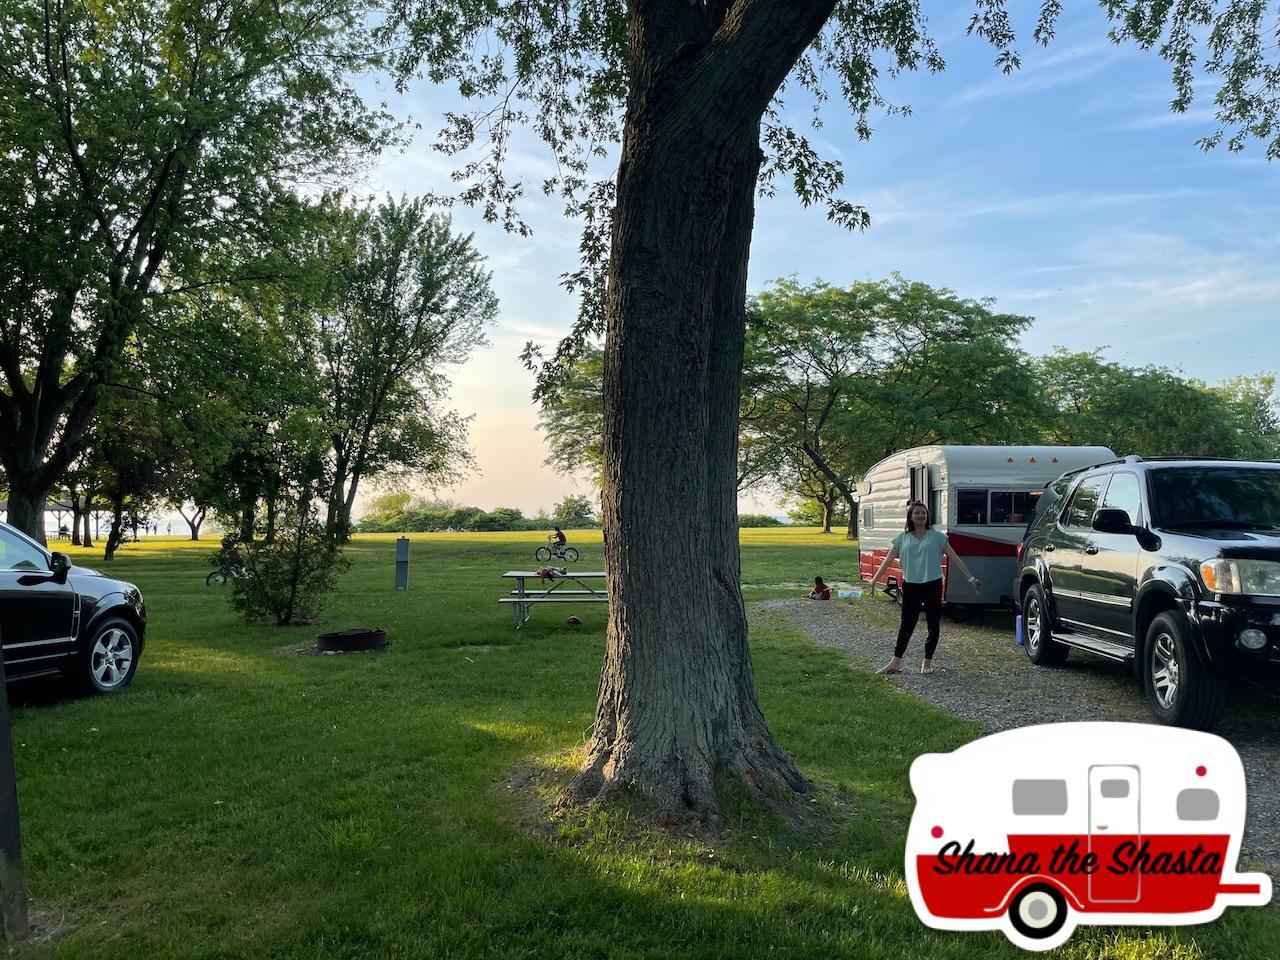 Campsite-89-4-Mile-Creek-State-Park